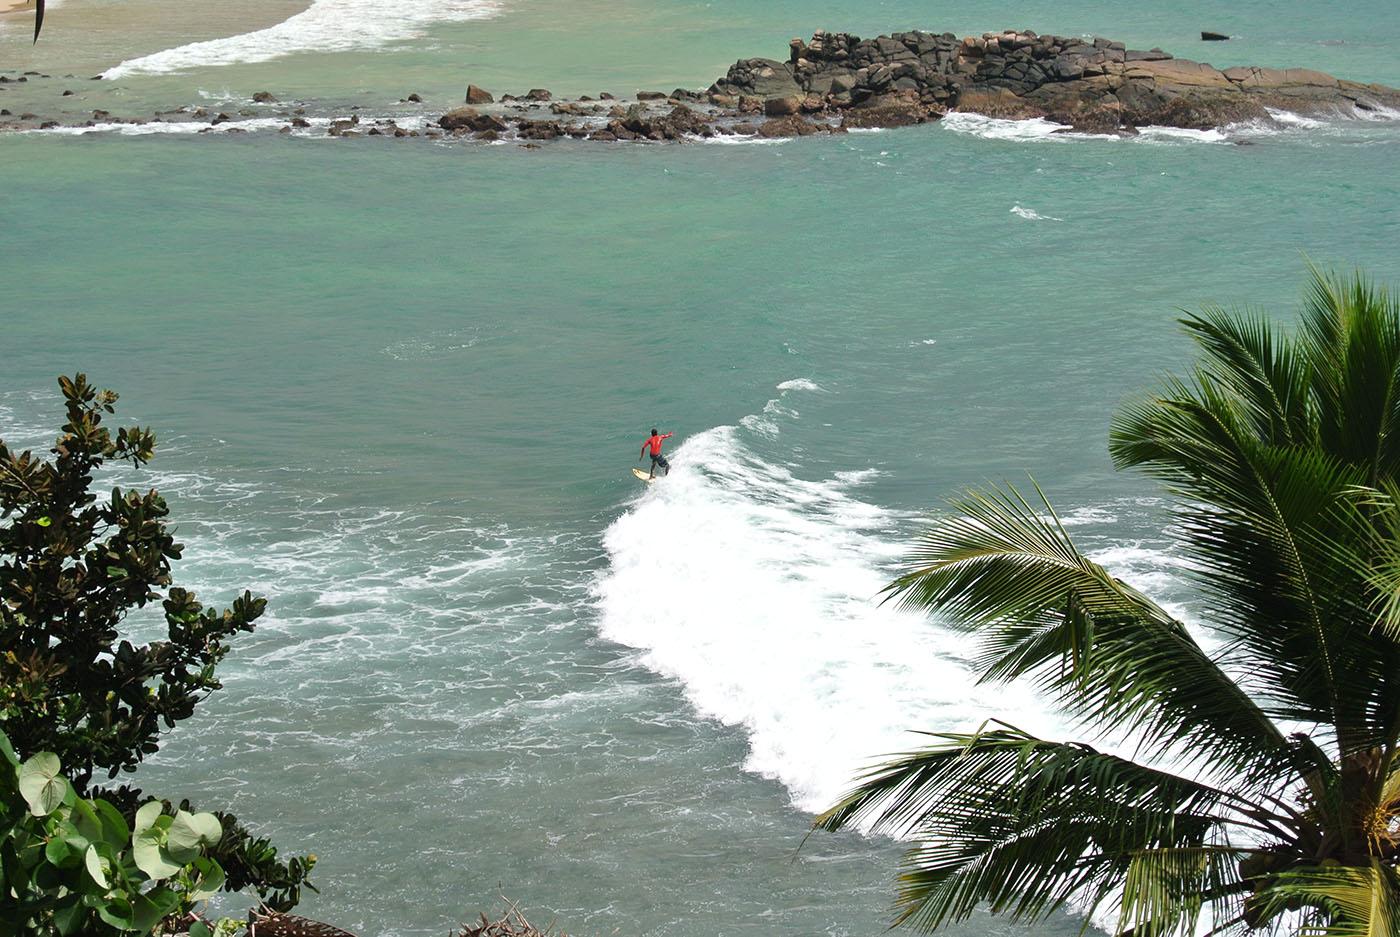 Sri Lanka surfing holiday